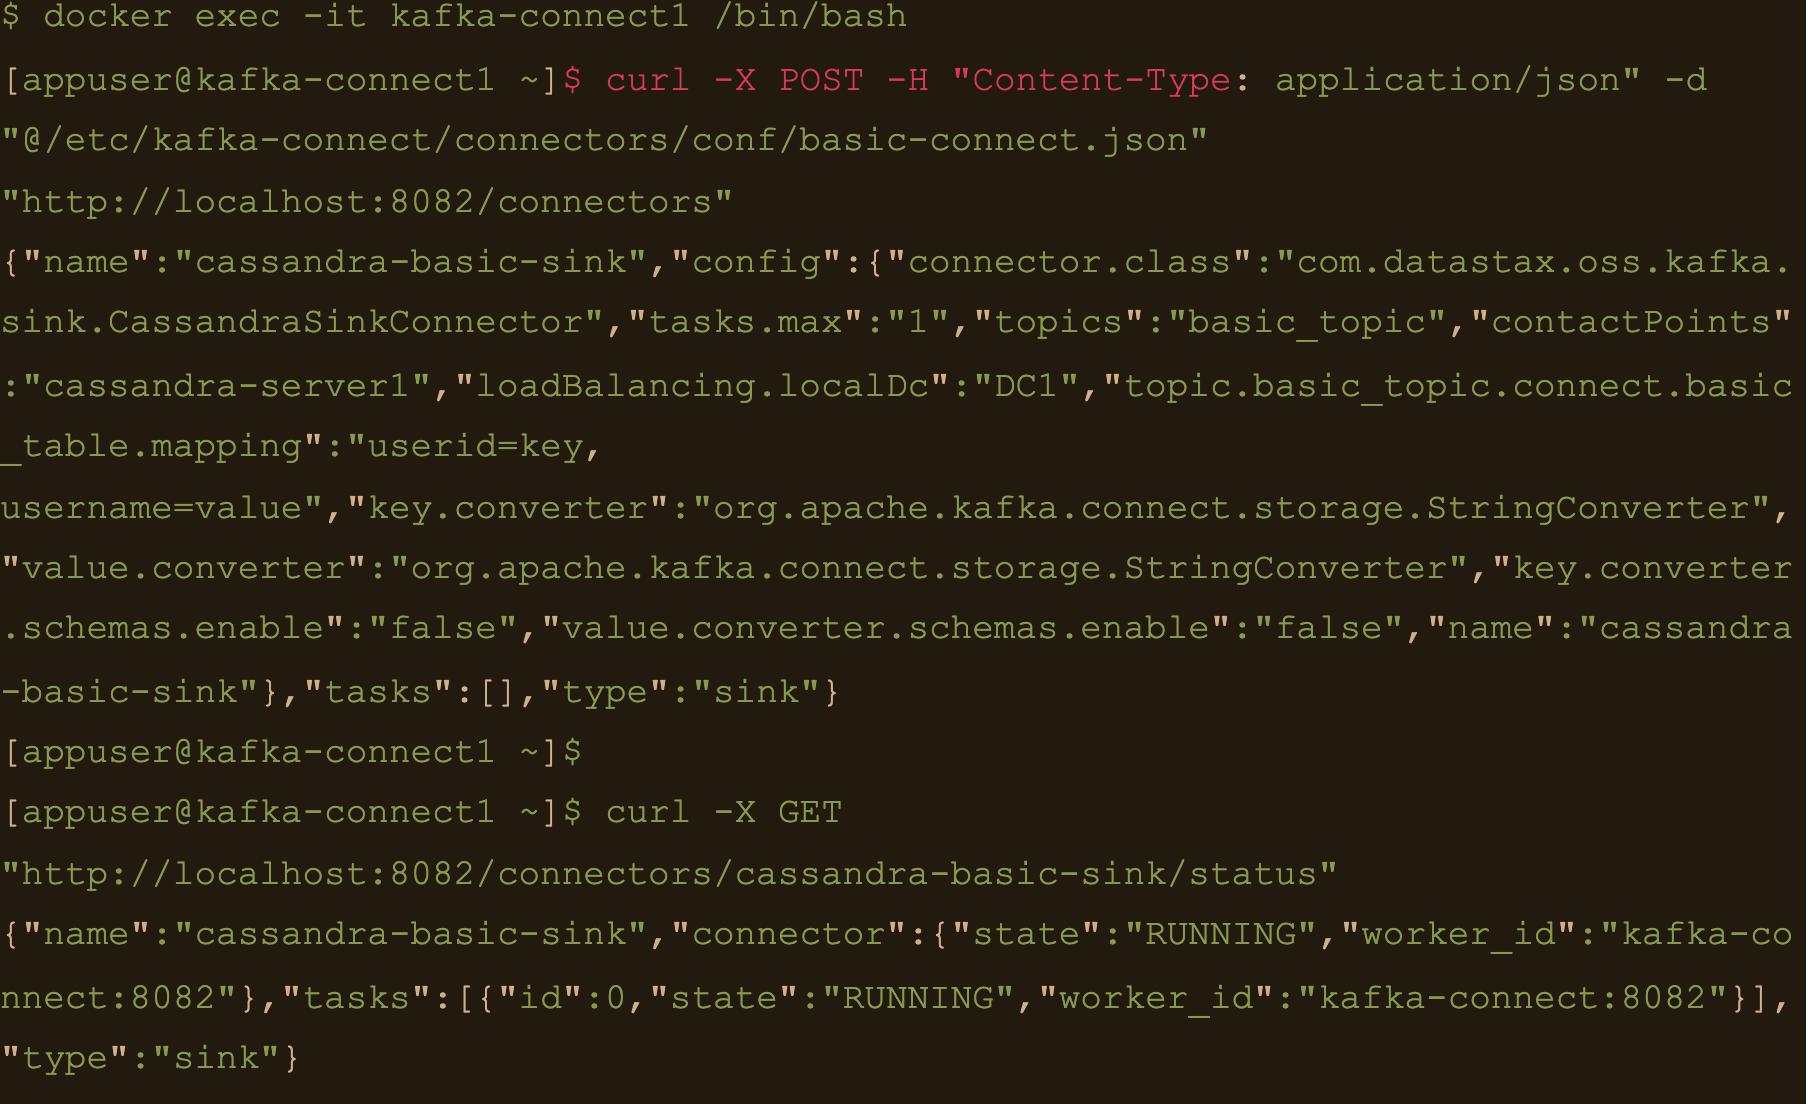 "curl -X GET ""http://localhost:8082/connectors/cassandra-basic-sink/status"""